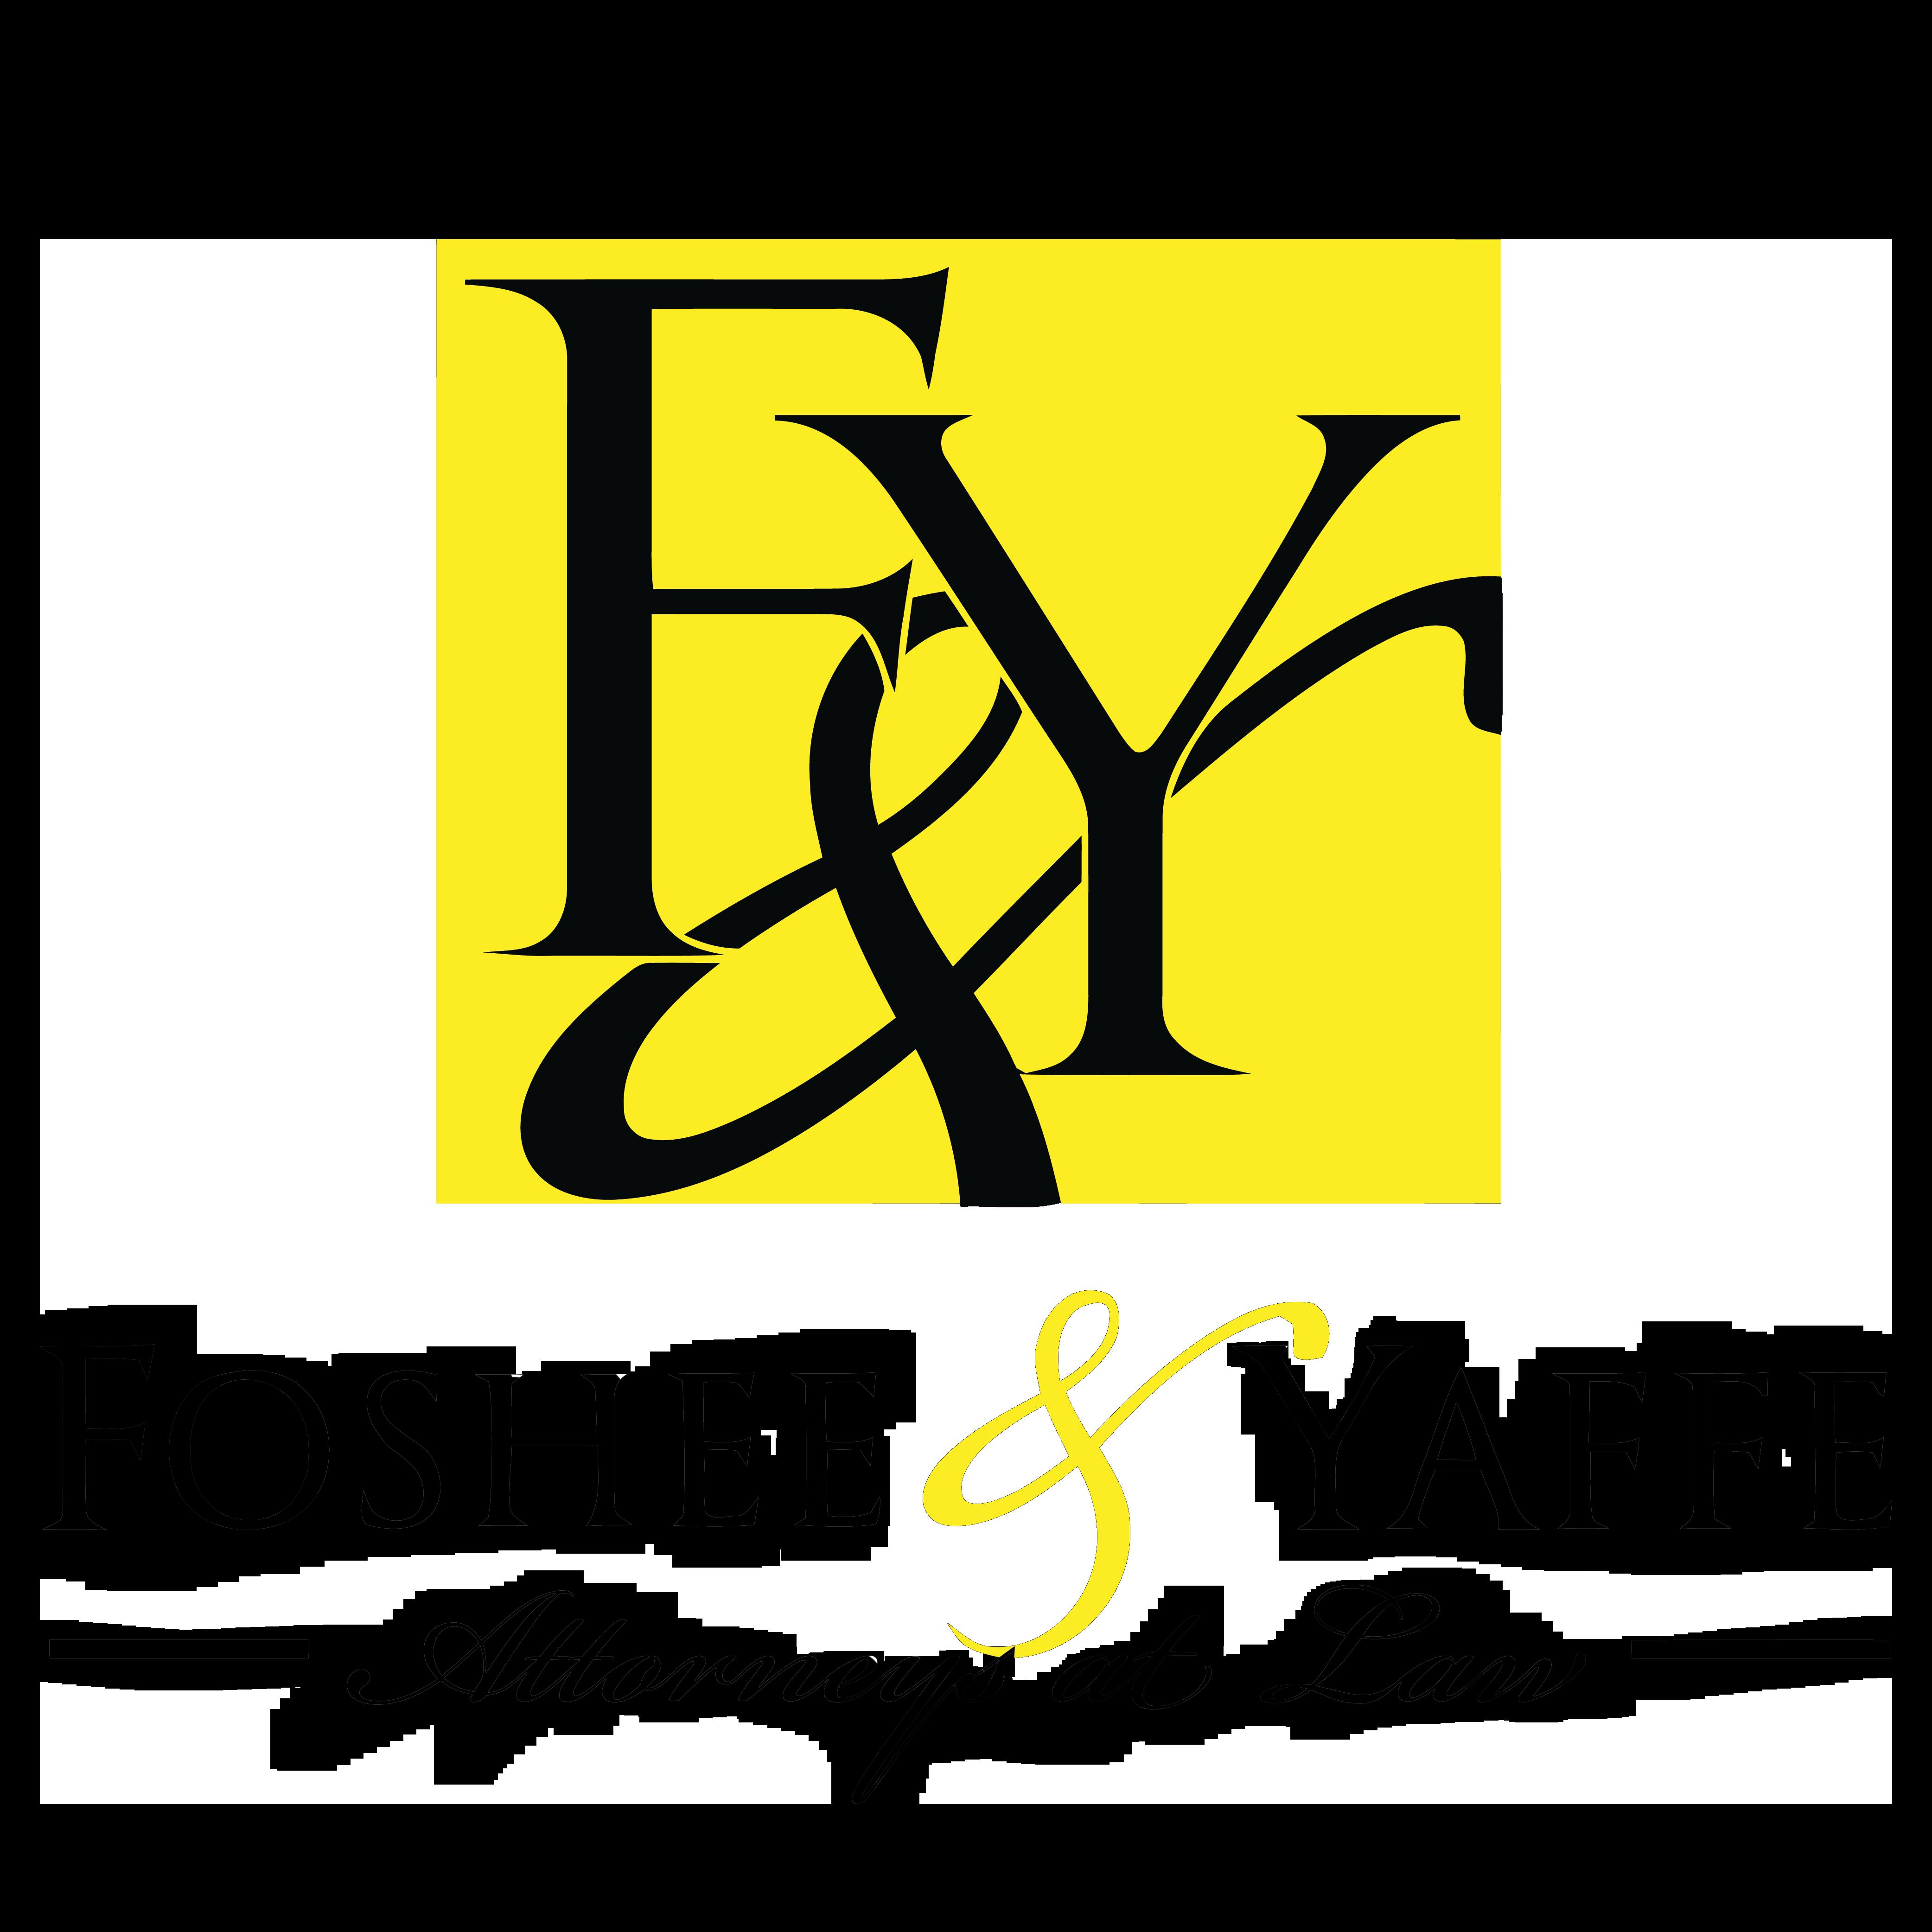 Foshee & Yaffe's logo